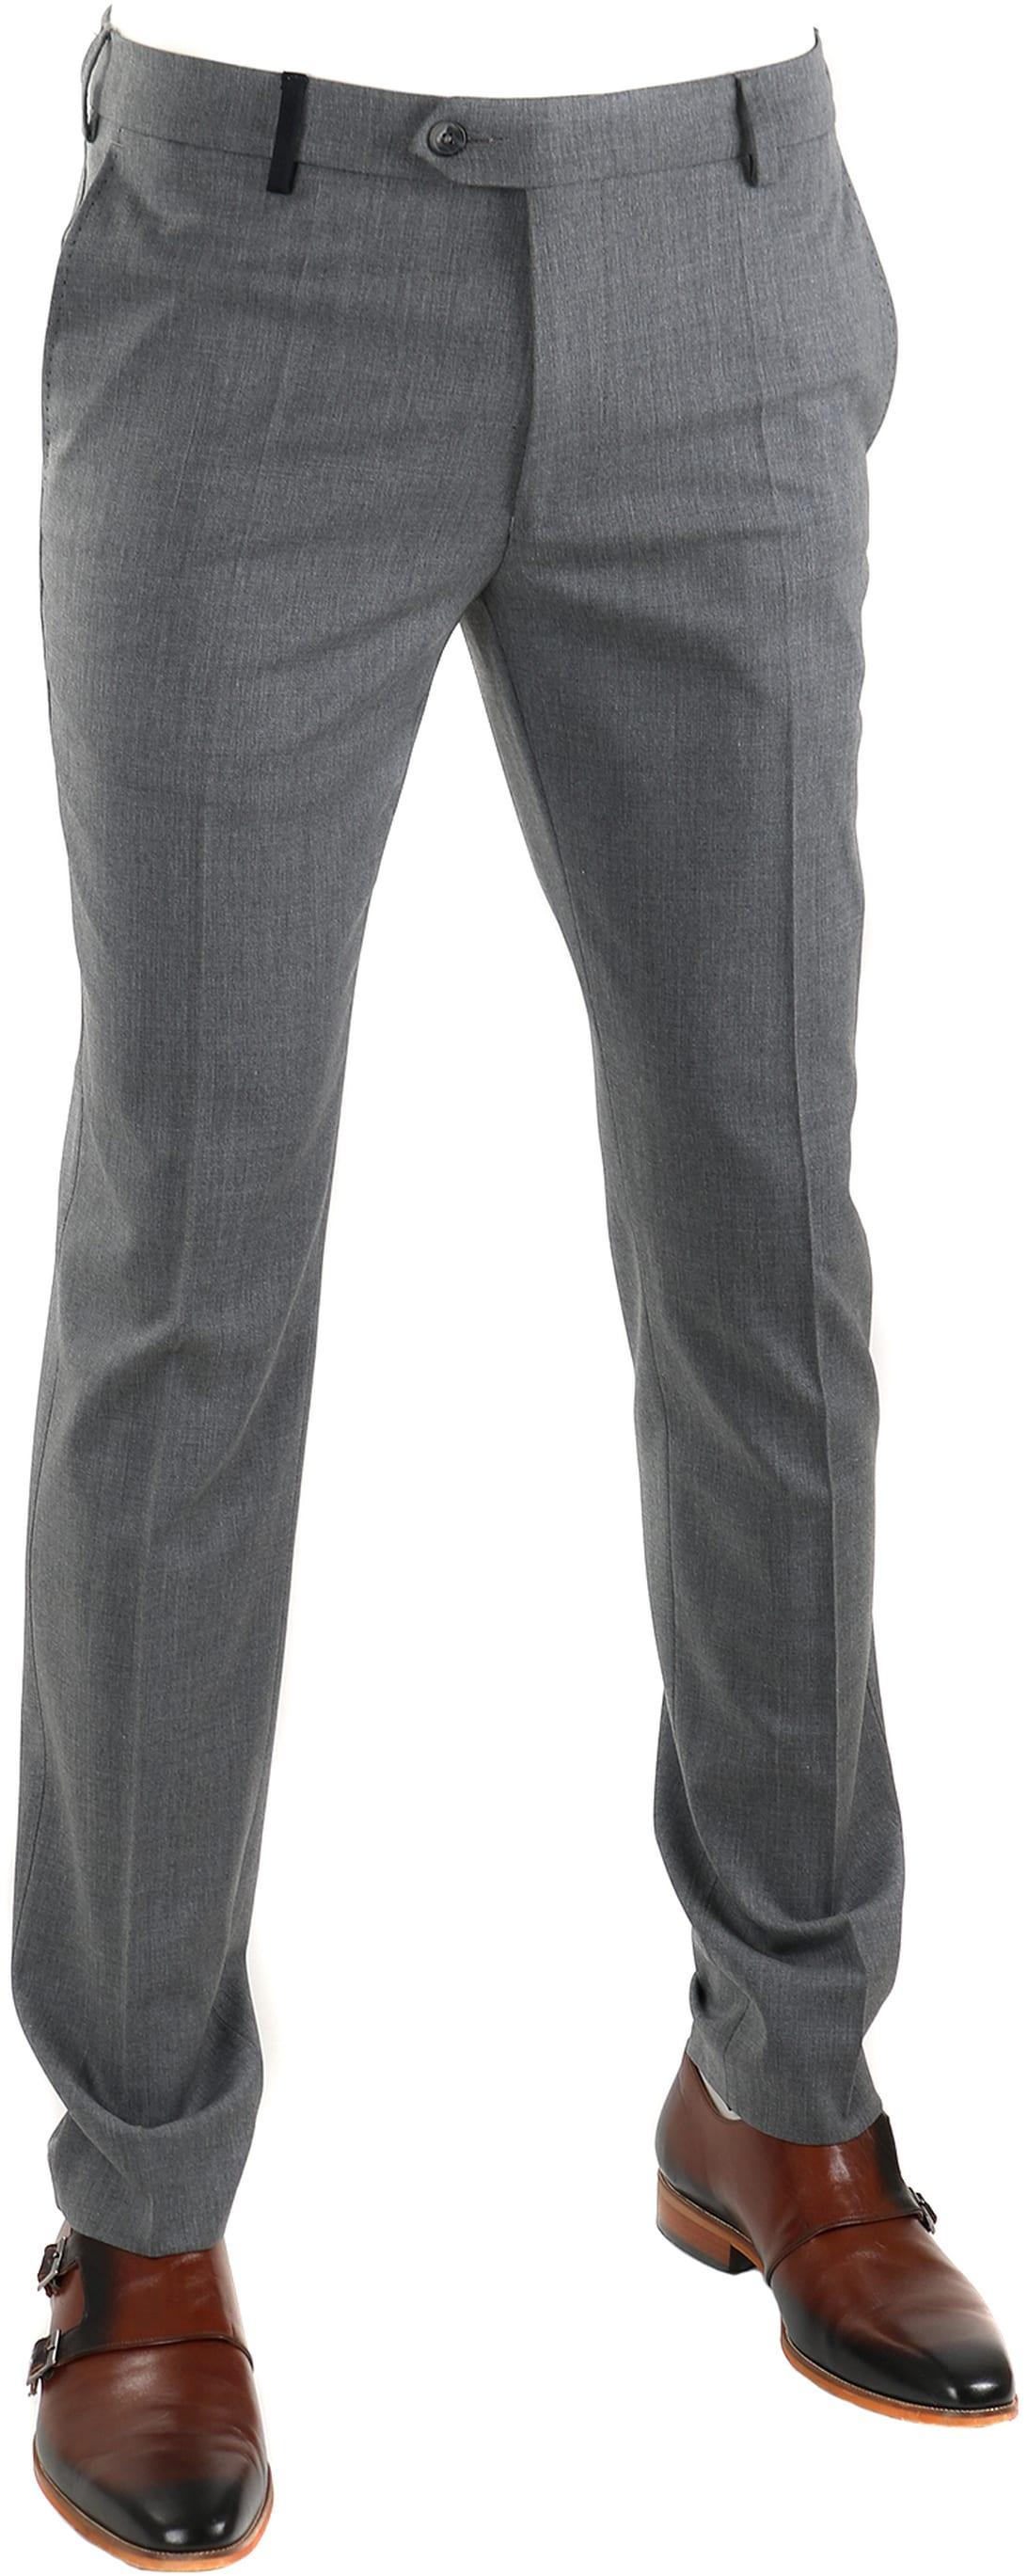 Suitable Pantalon Middengrijs foto 0